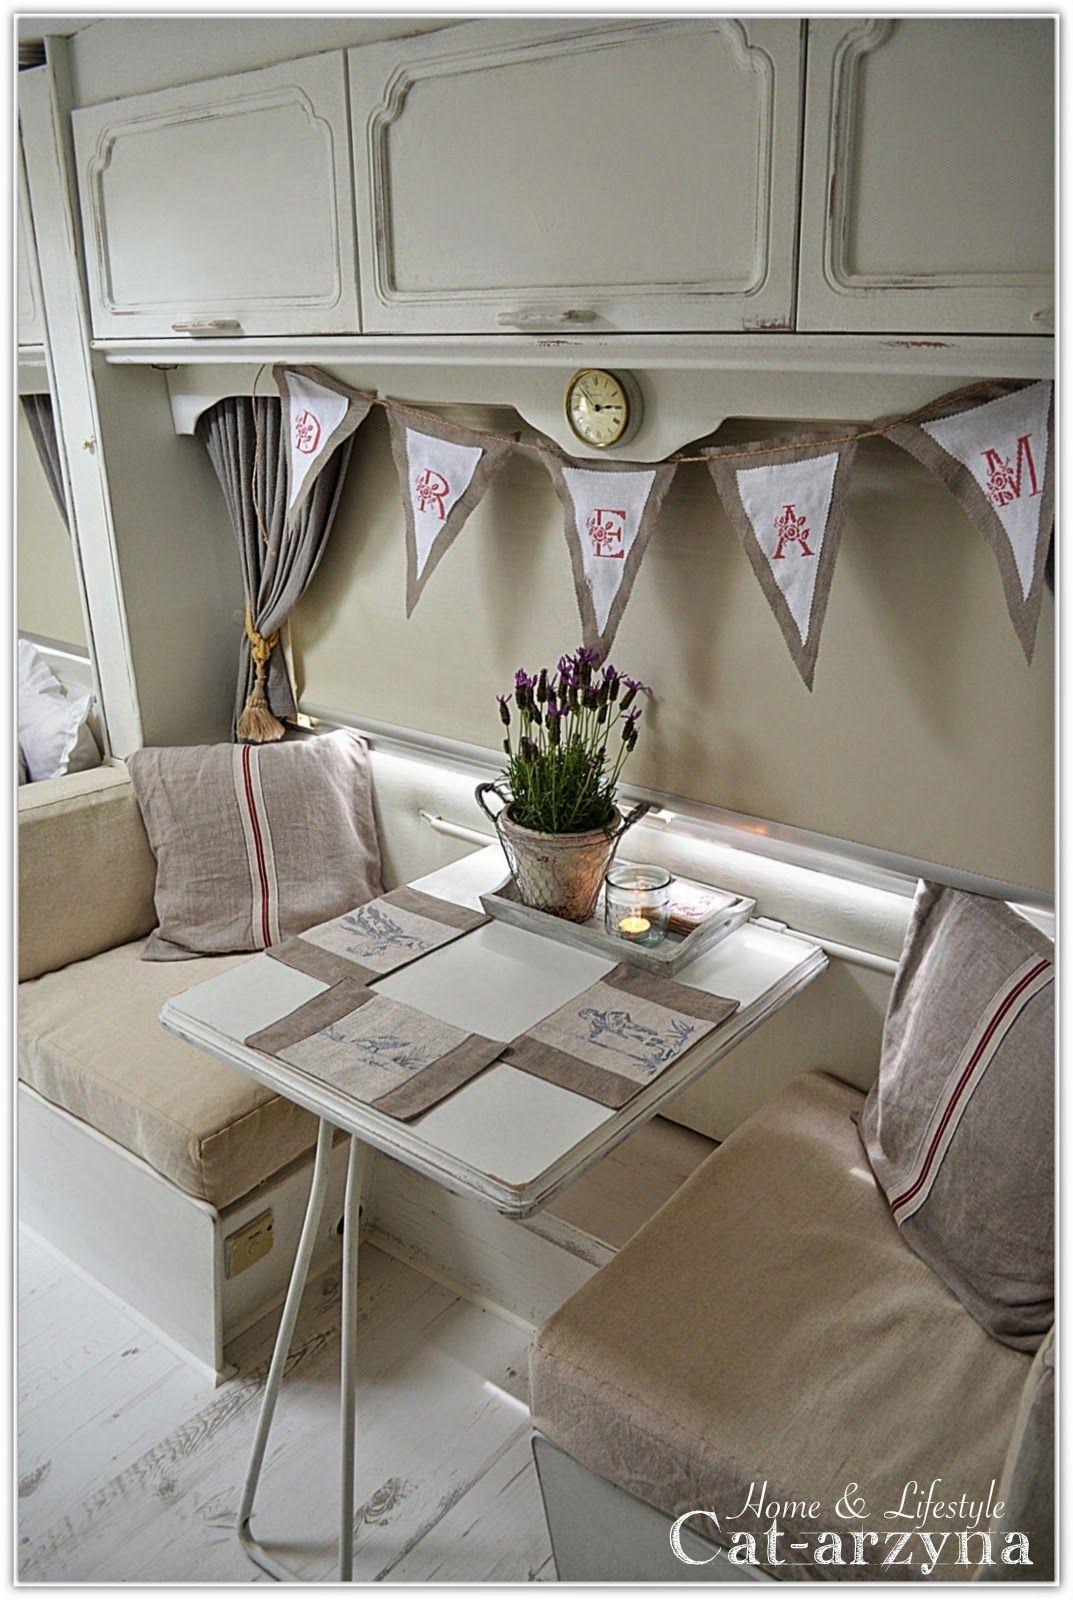 Cottage caravana pinterest decoraci n de caravana interiores de caravanas y caravana retro - Decoracion interior caravanas ...